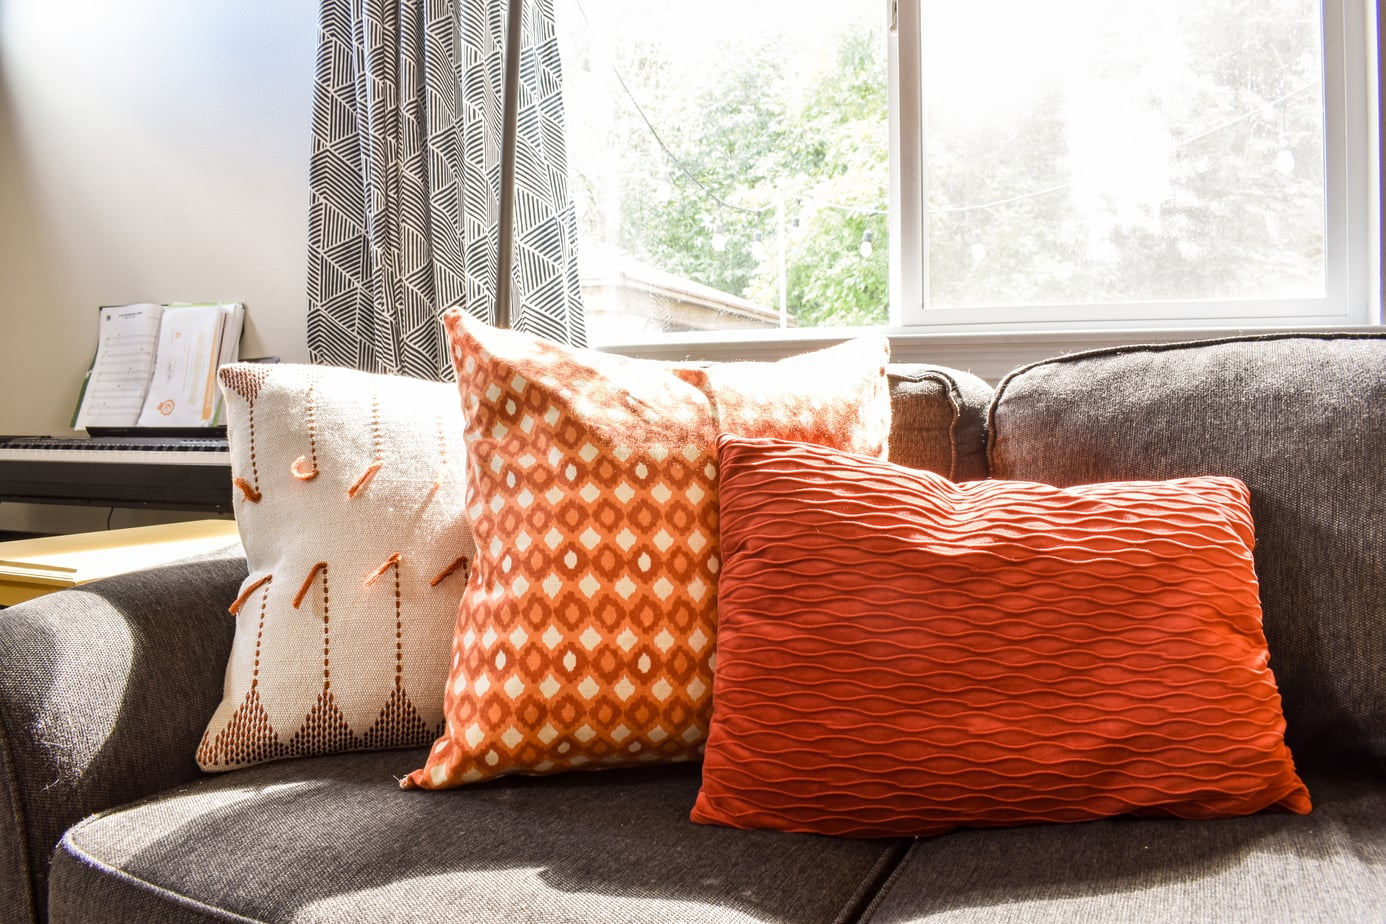 photo of cozy Fall throw pillows on sofa